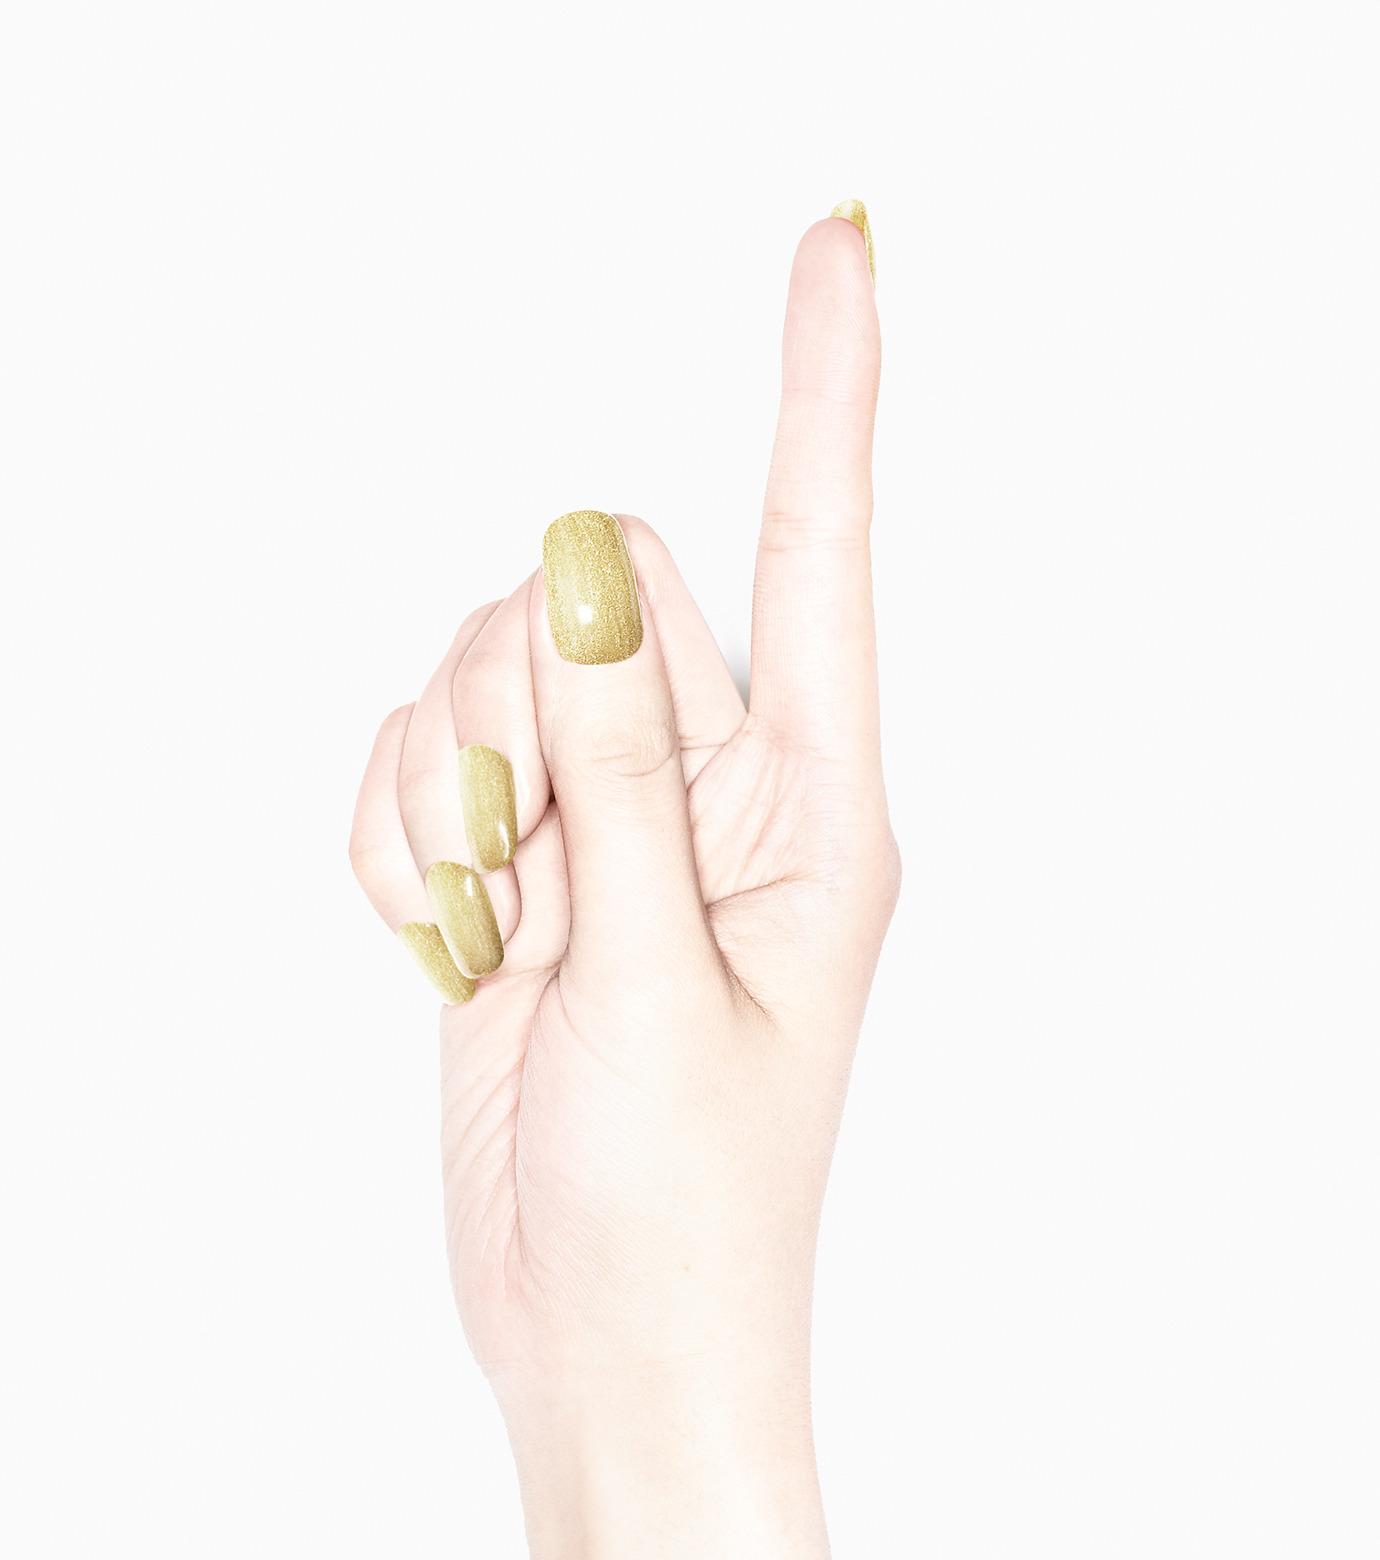 GRANJE(グランジェ)のFlashy Flashy-GOLD(MAKE-UP/MAKE-UP)-115-2 拡大詳細画像2